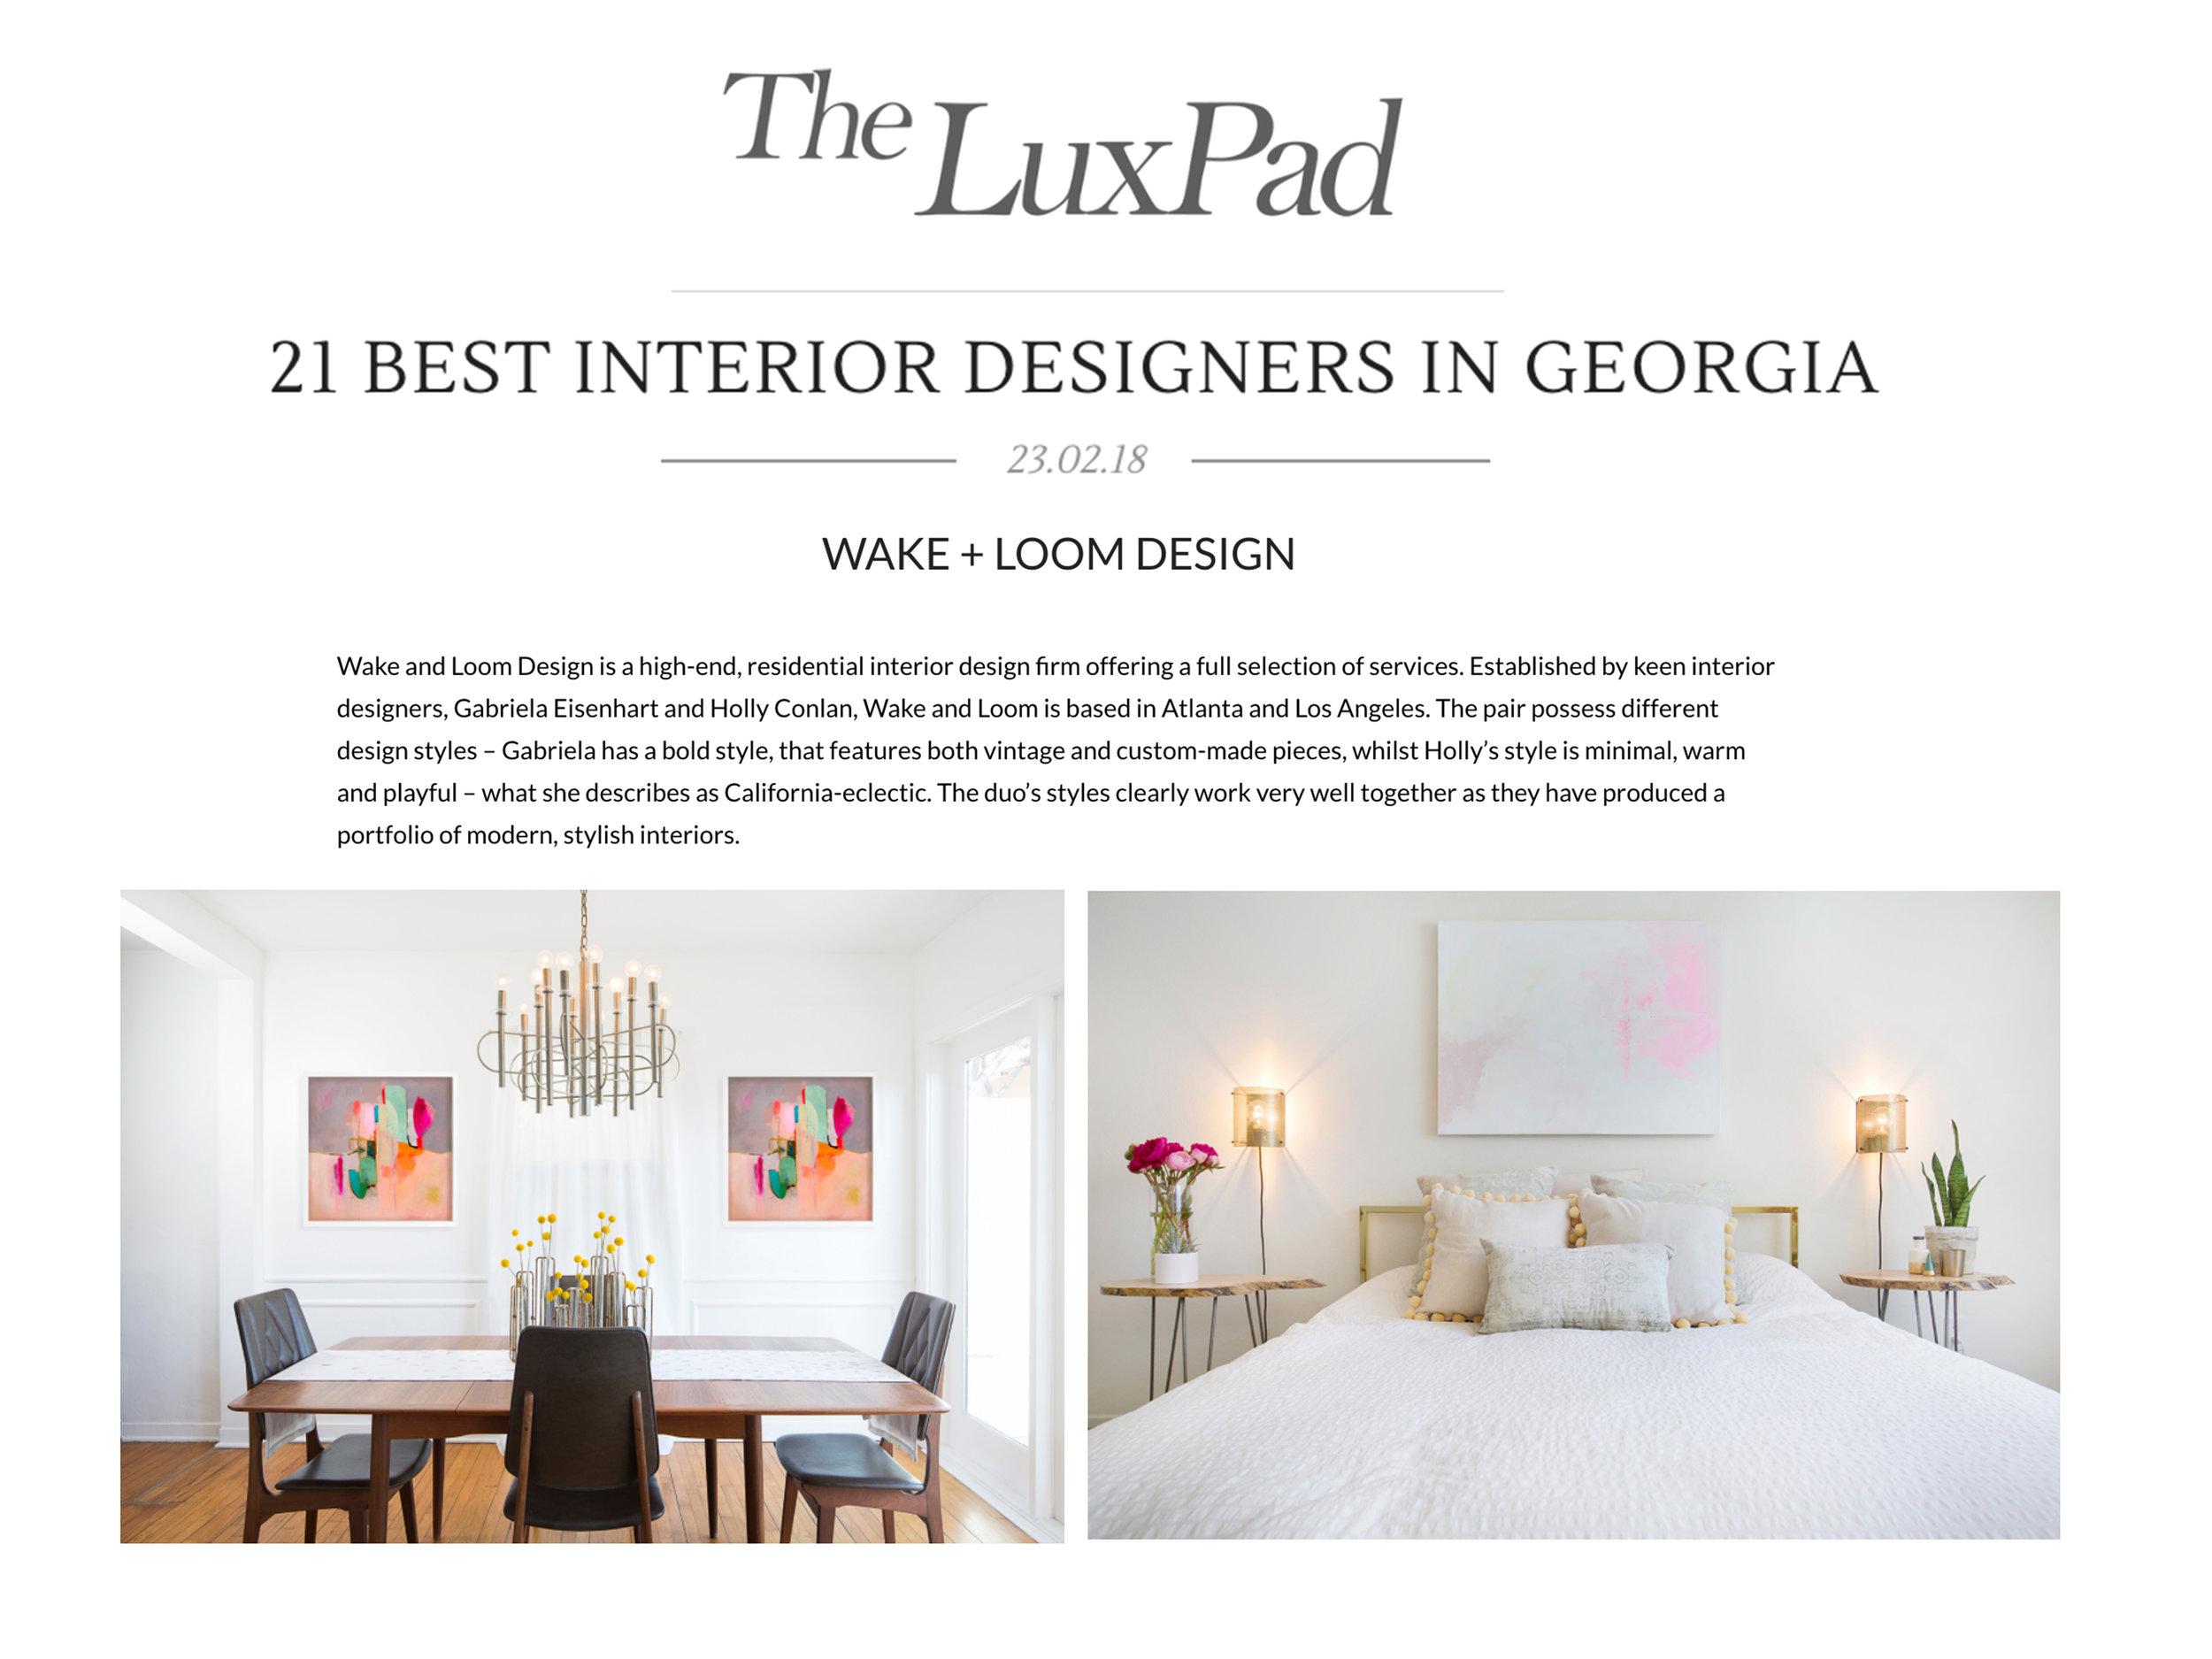 The Lux Pad.jpg